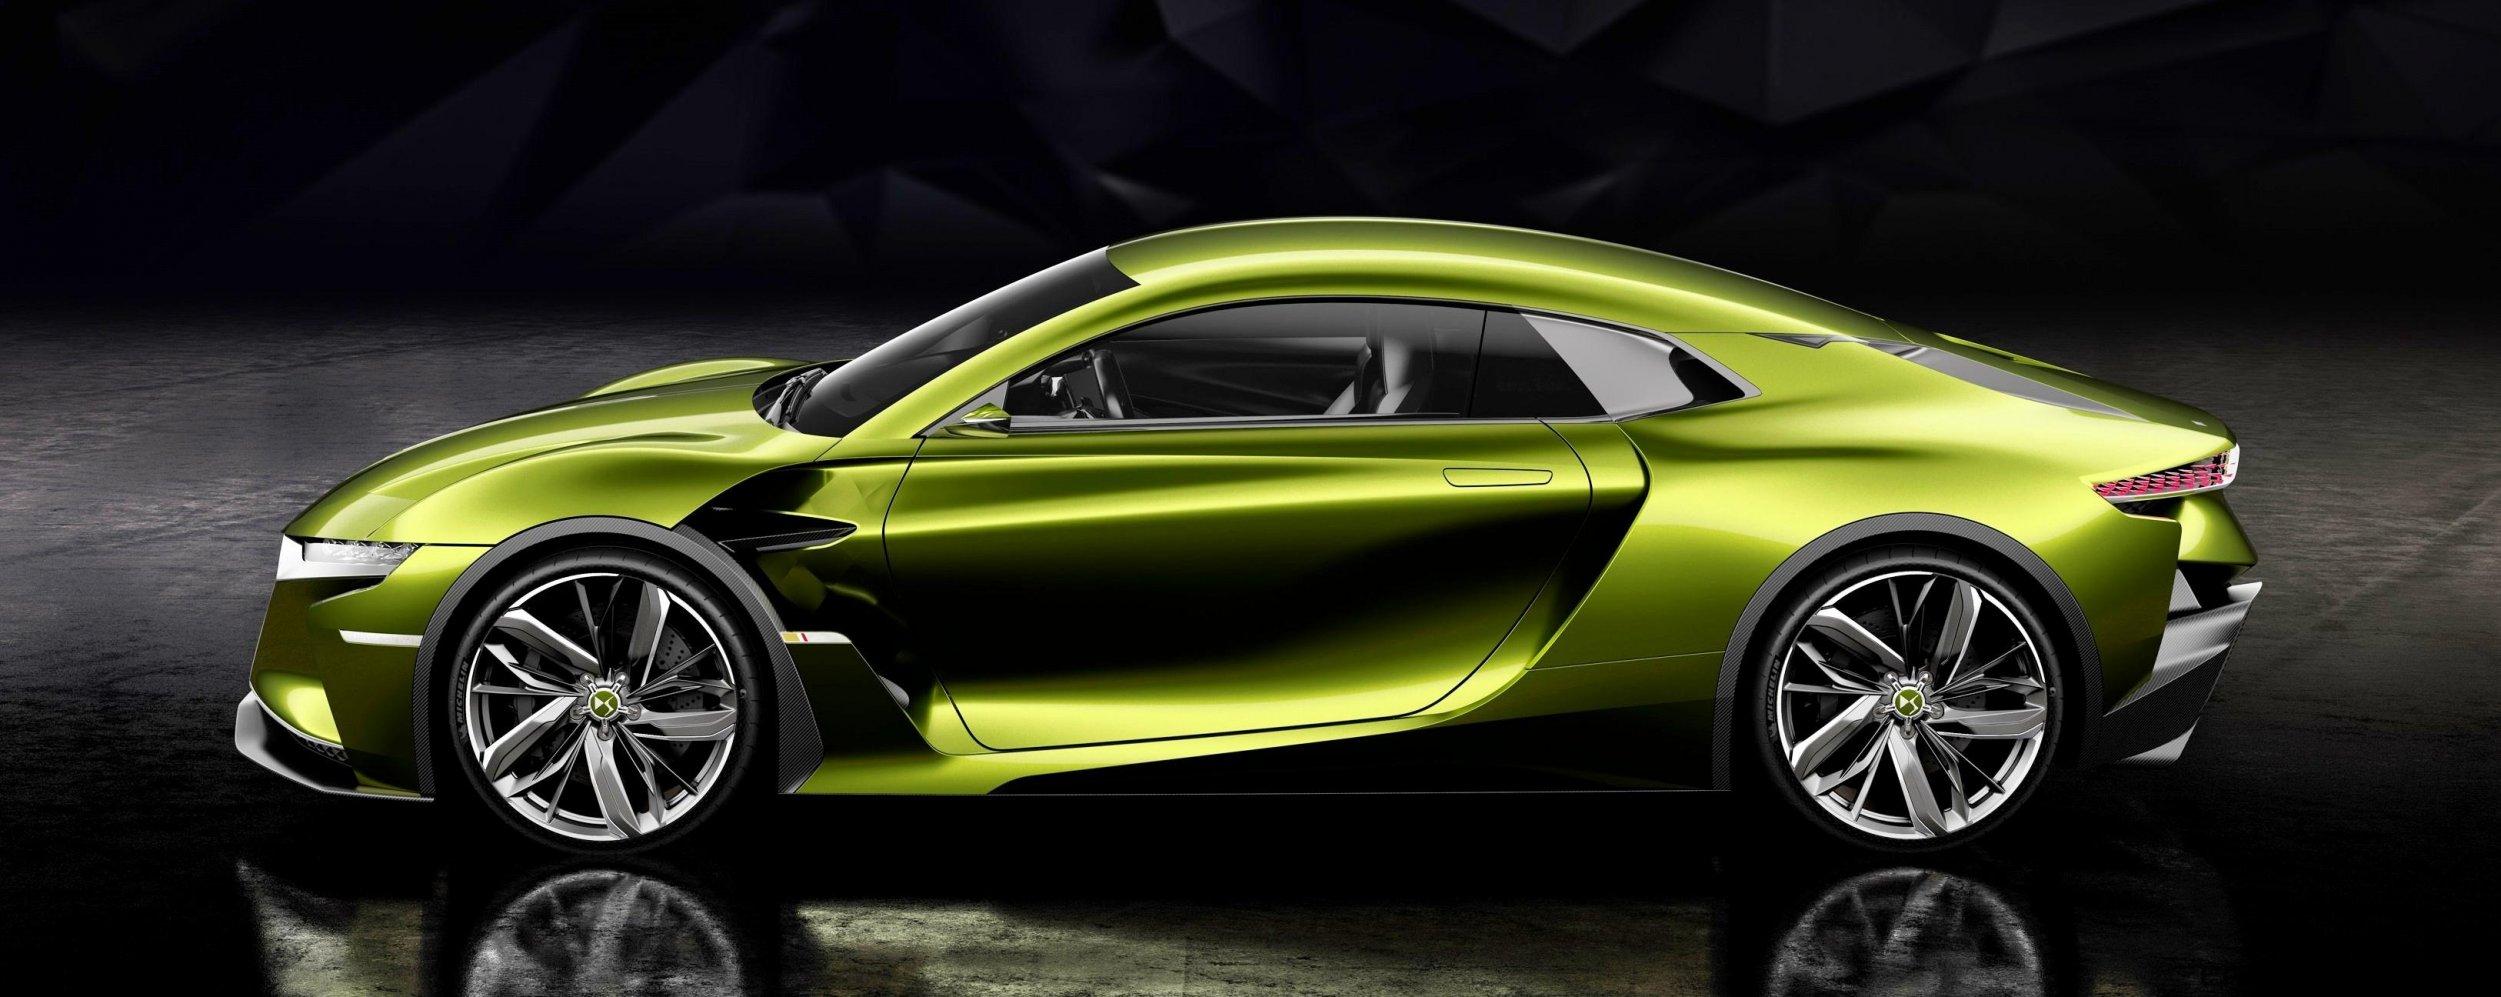 2016 ds e tense fantasy color visualizer of full balls for Concept car 2016